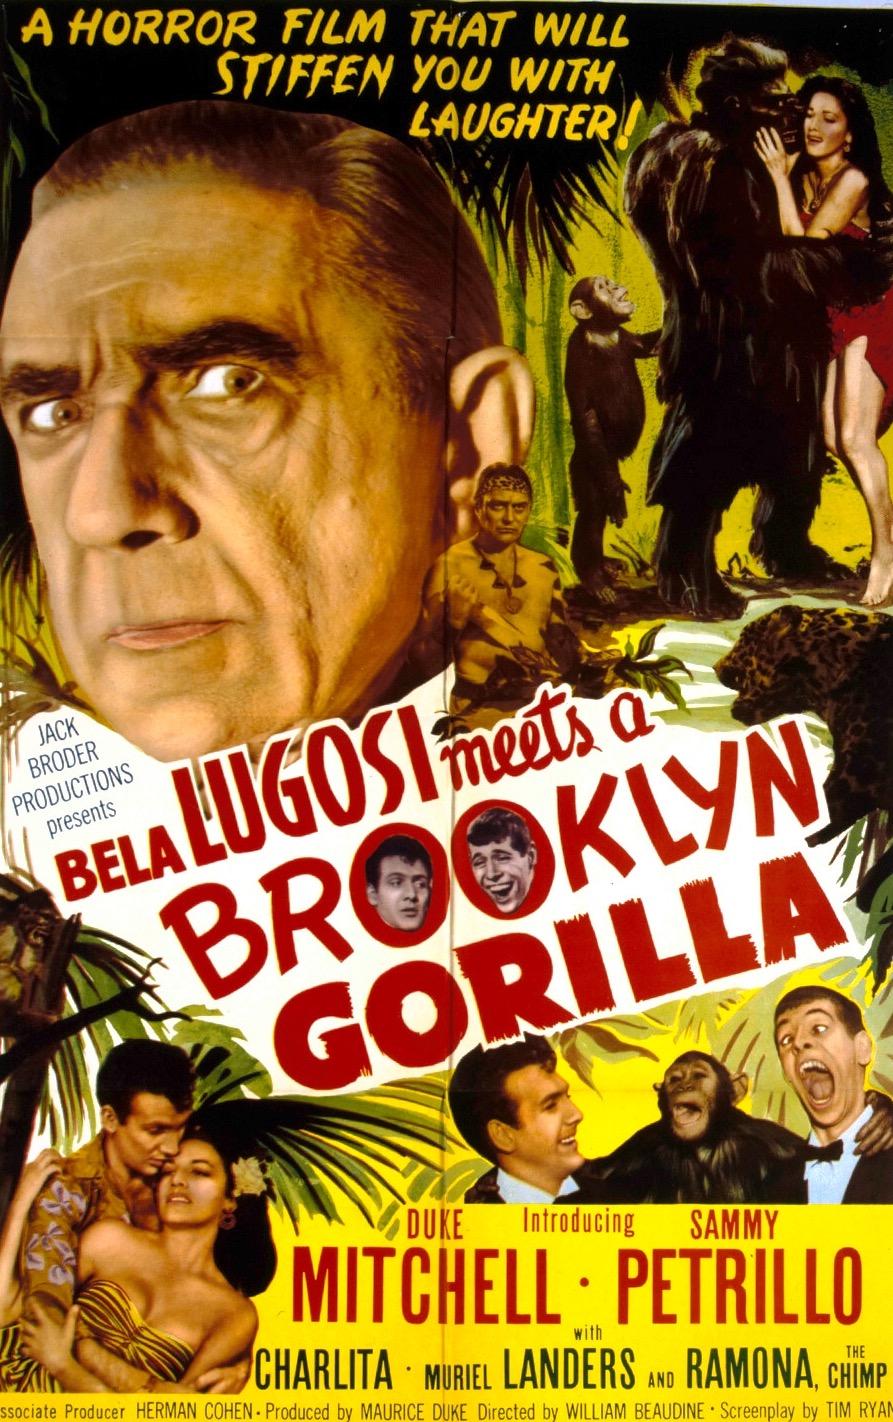 Bela Lugosi Meets a Brooklyn Gorilla kapak